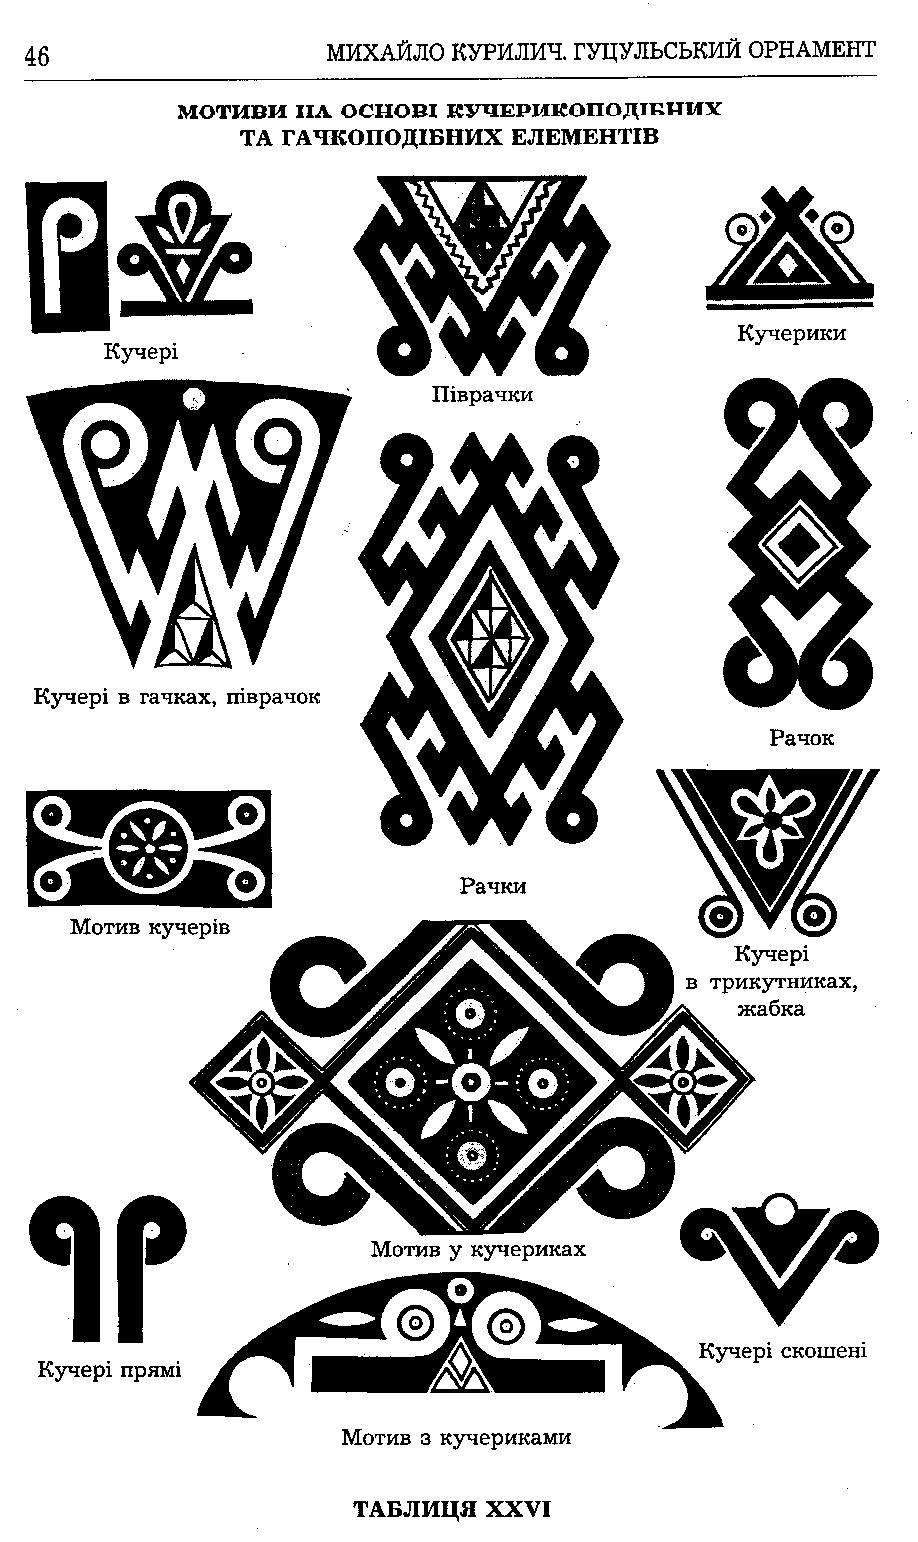 Tablitsya26-Motivi-na-osnovi-kucherikopodibnih-ta-gachkopodibnih-elementiv